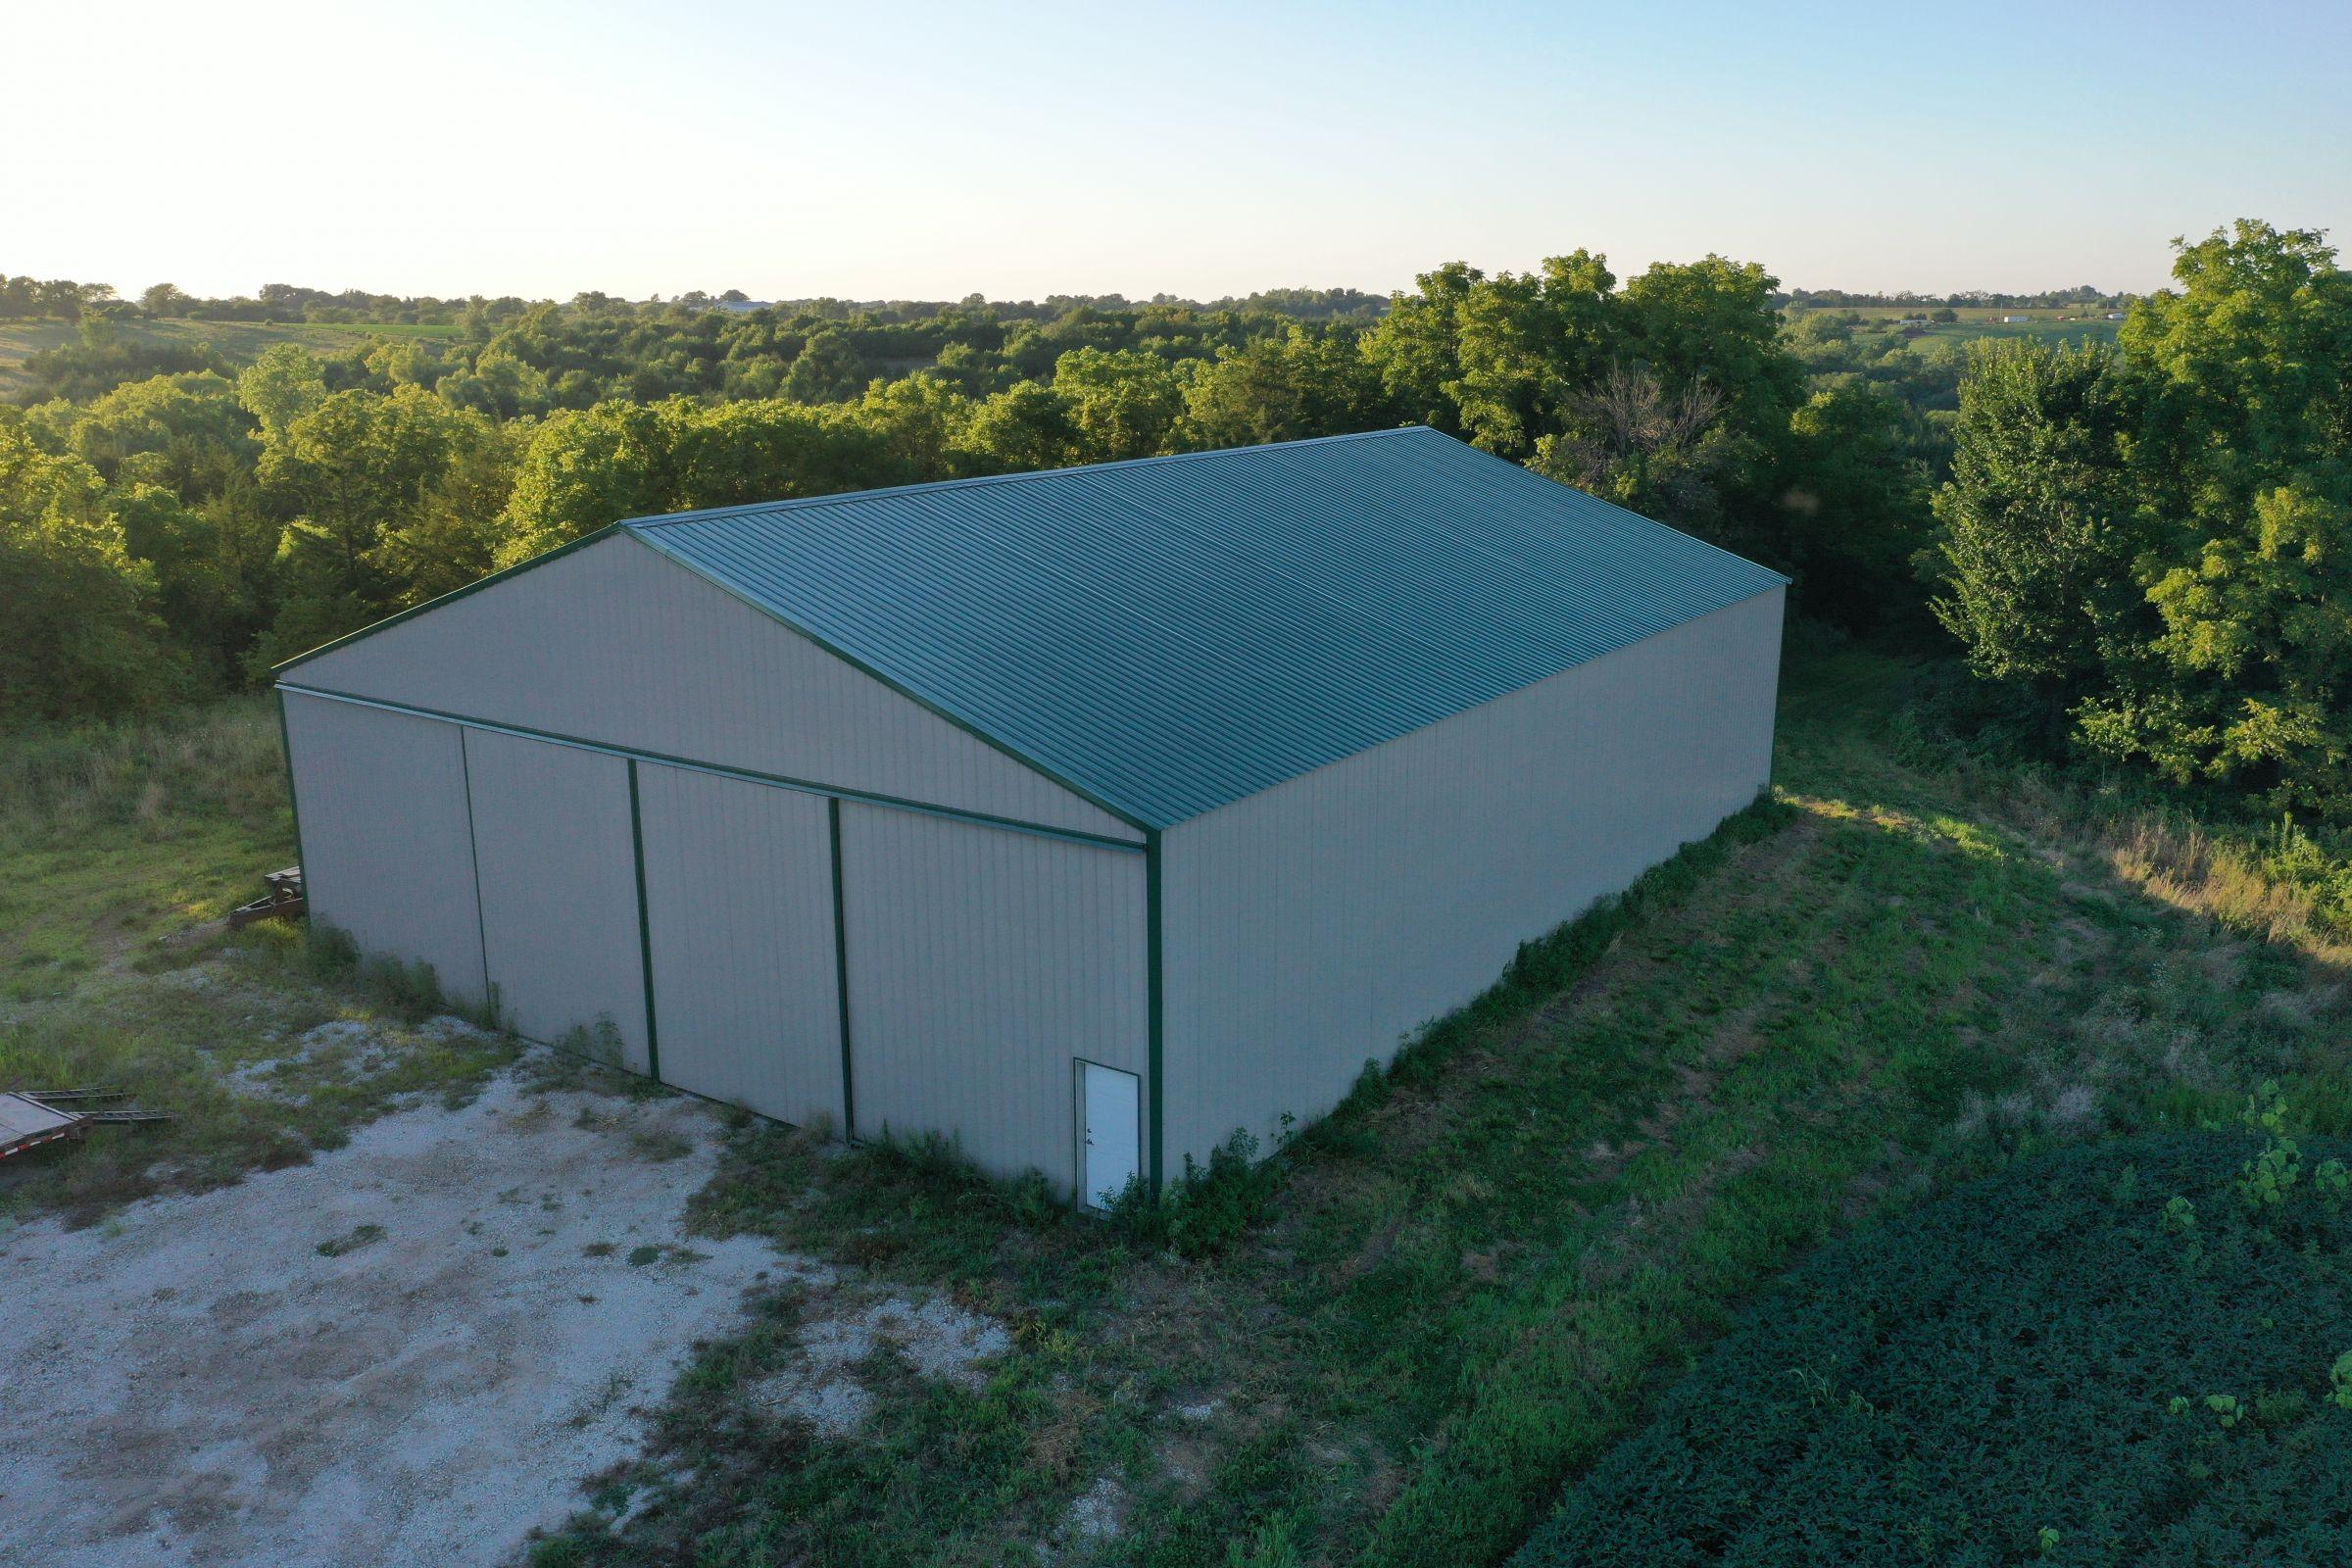 land-clarke-county-iowa-325-acres-listing-number-15416-0-2021-03-19-172702.JPG